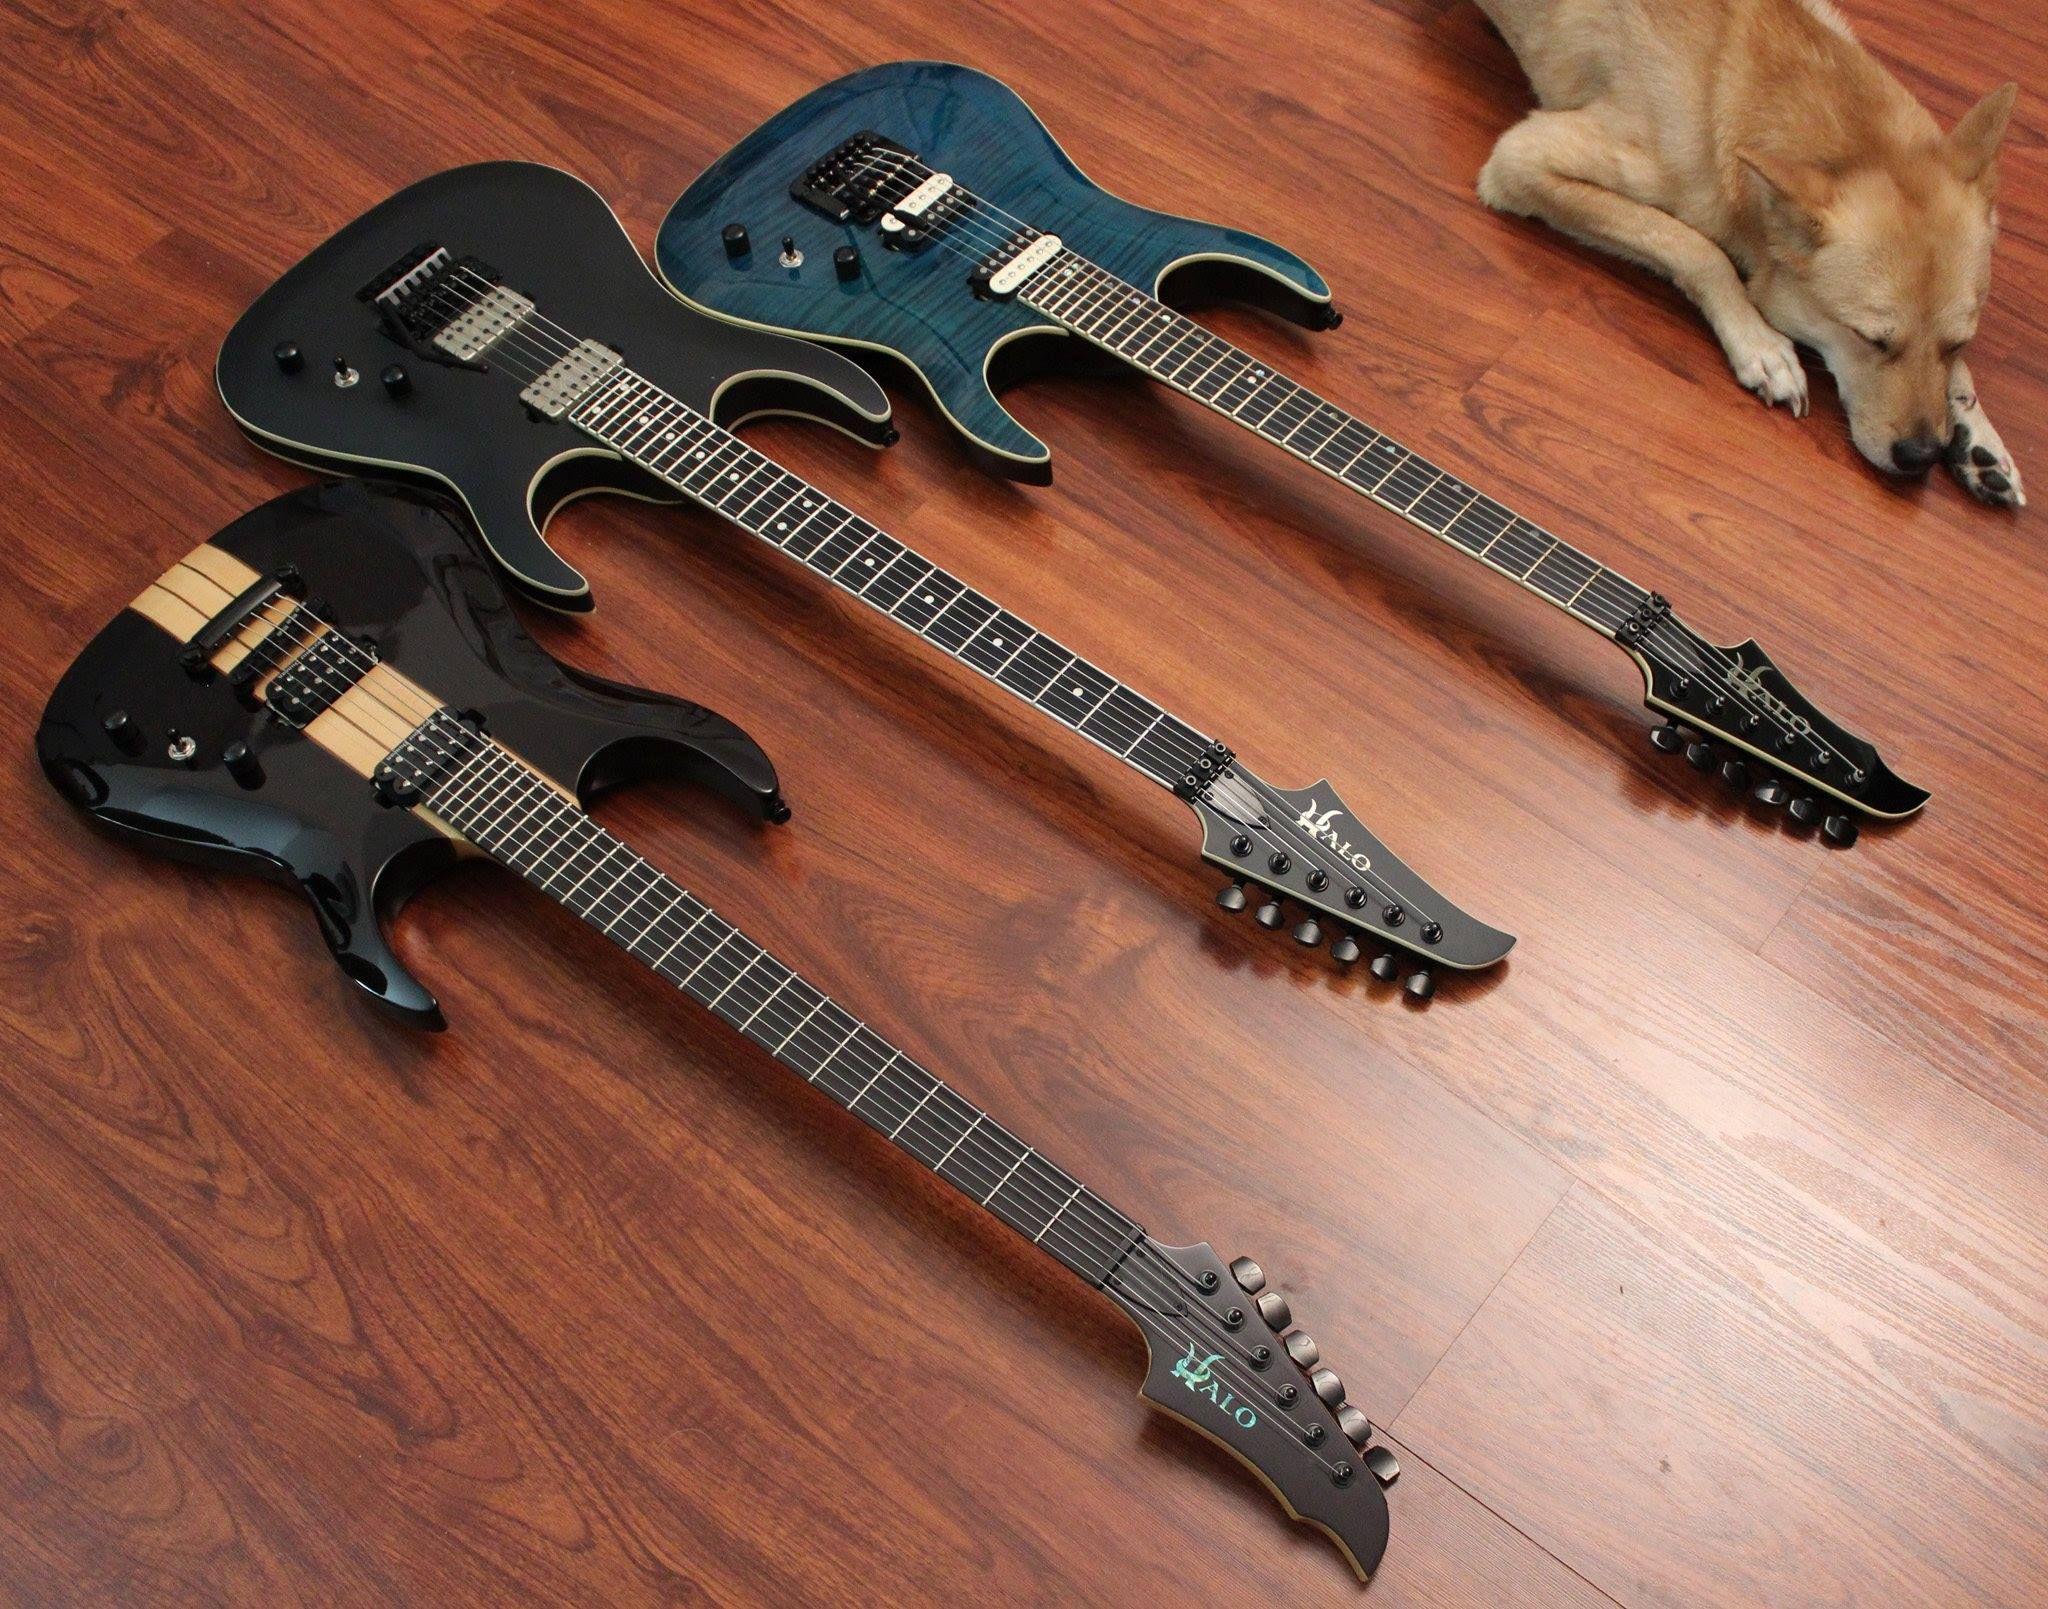 Pin By Ricci Peyroux On Halo Guitars Pinterest Guitars